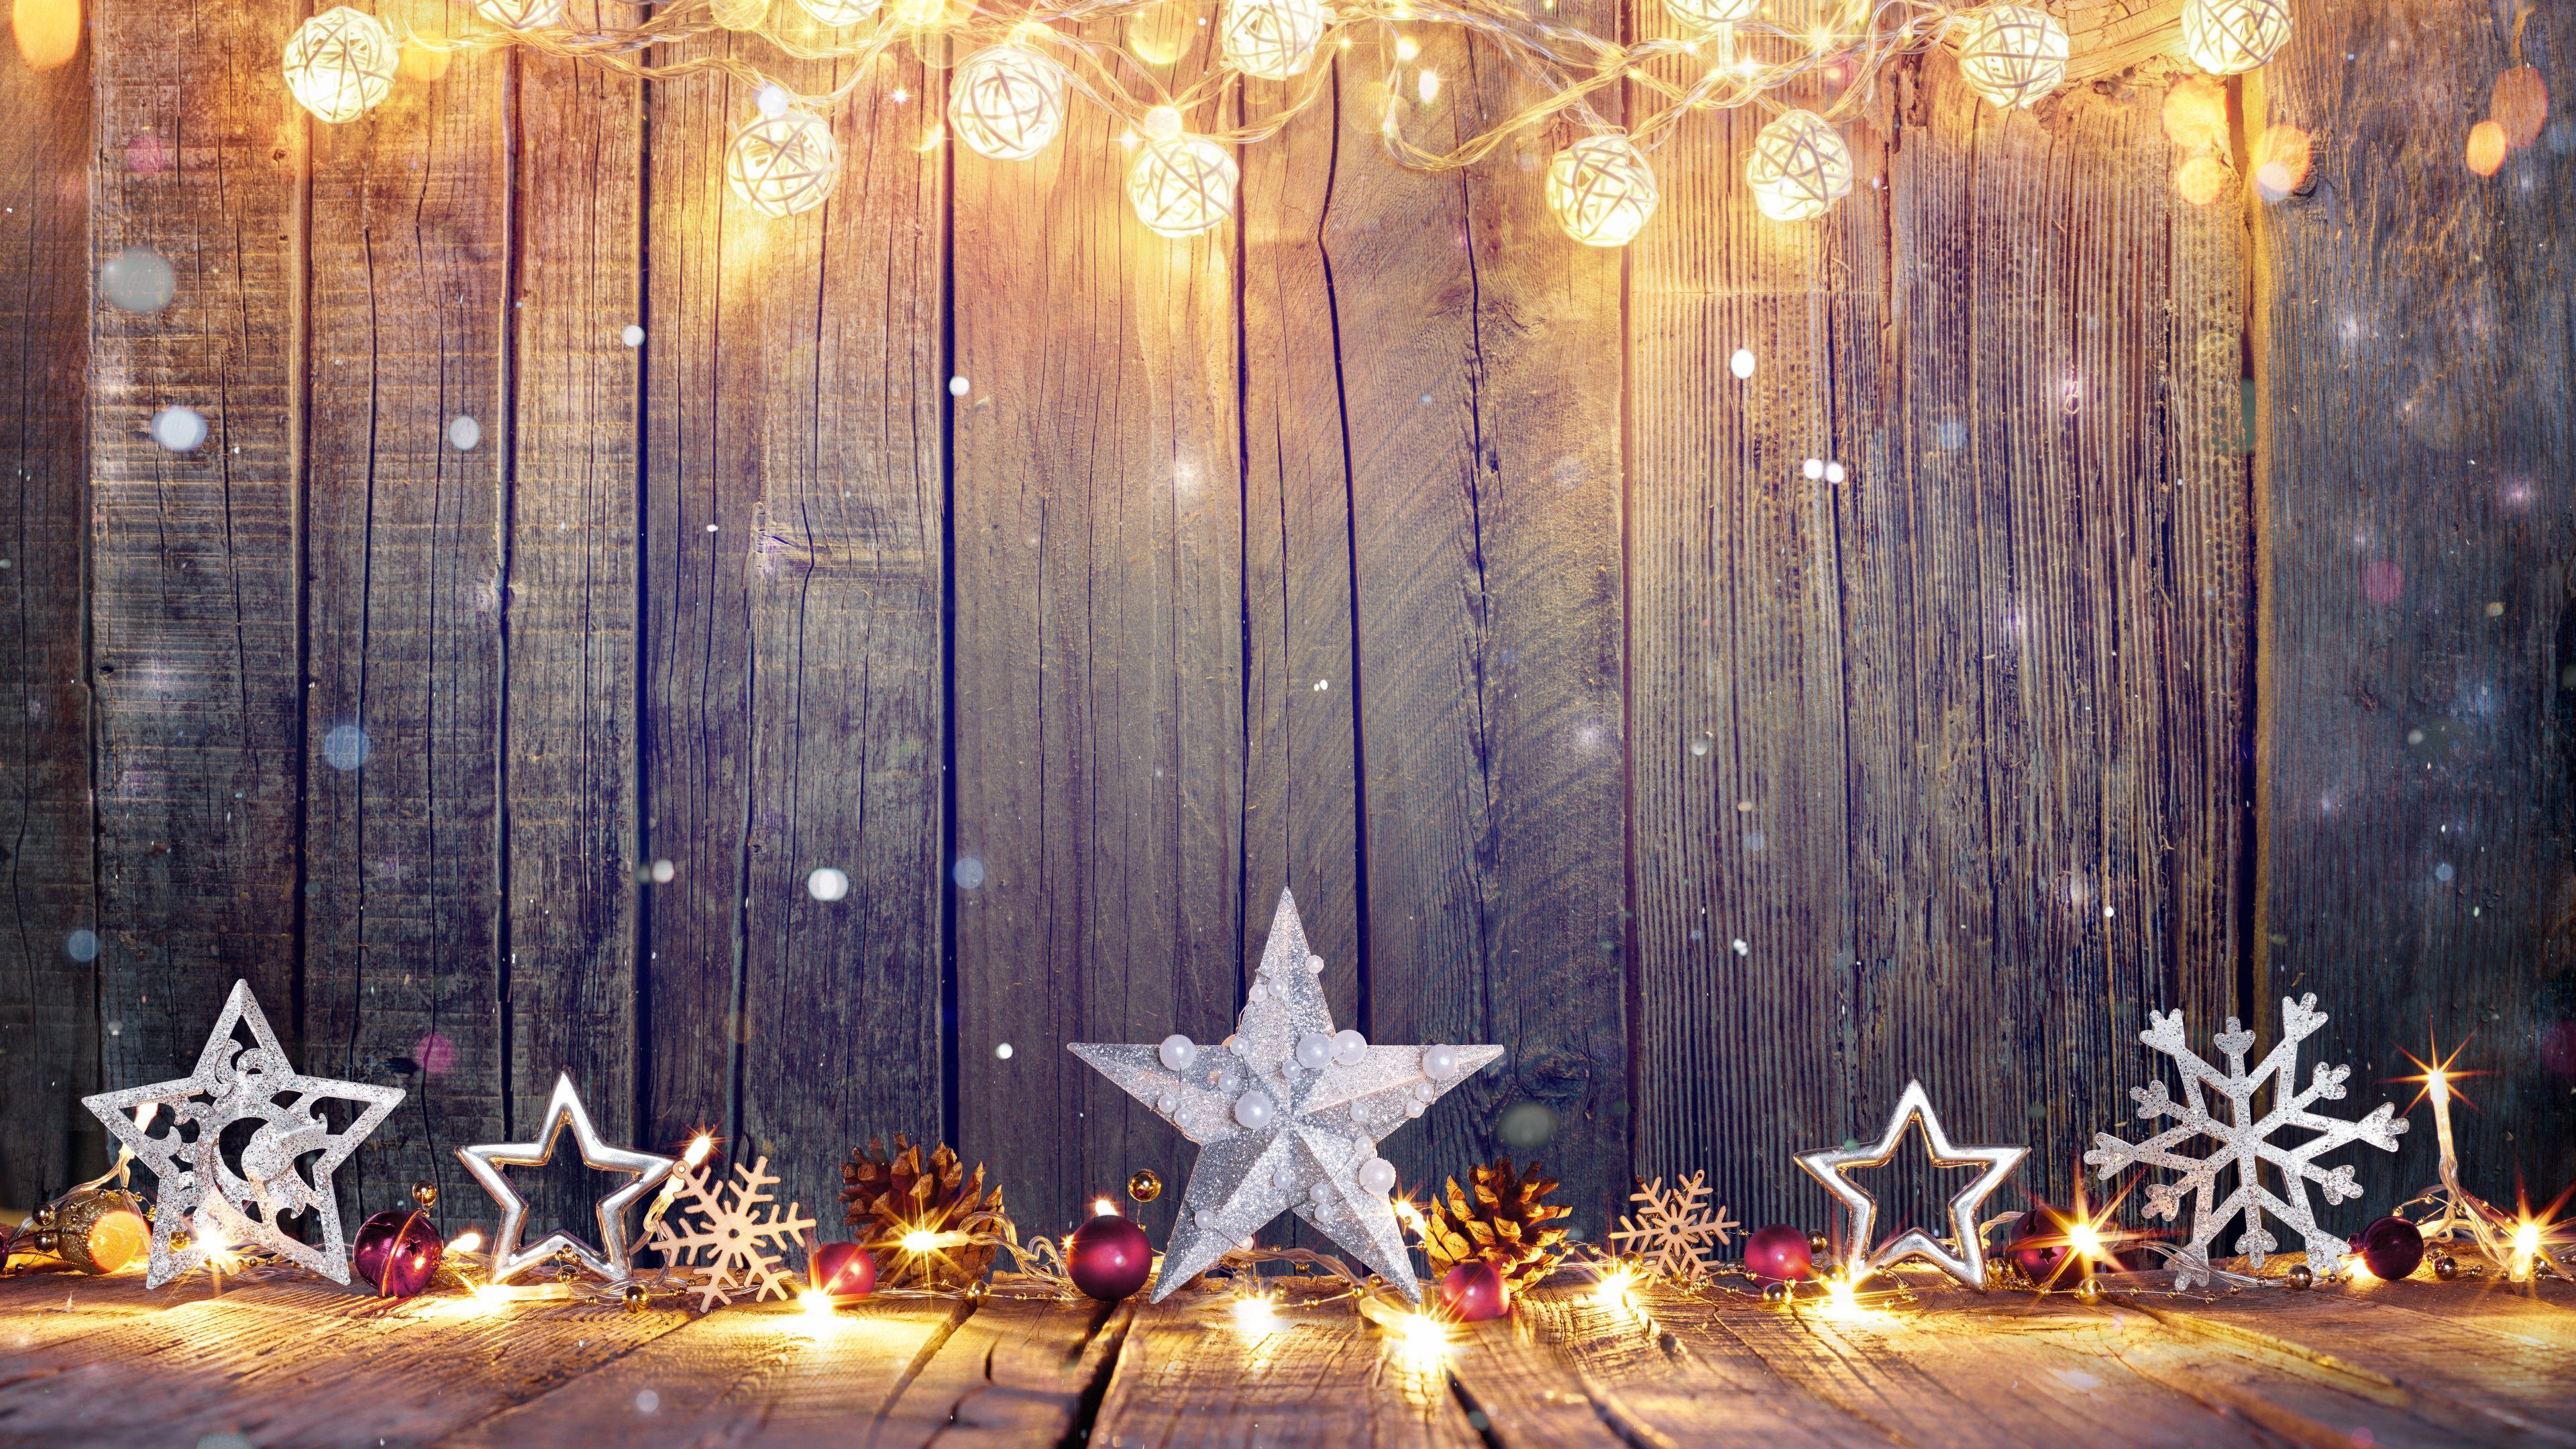 4k Christmas star holidays wallpapers, hdwallpapers